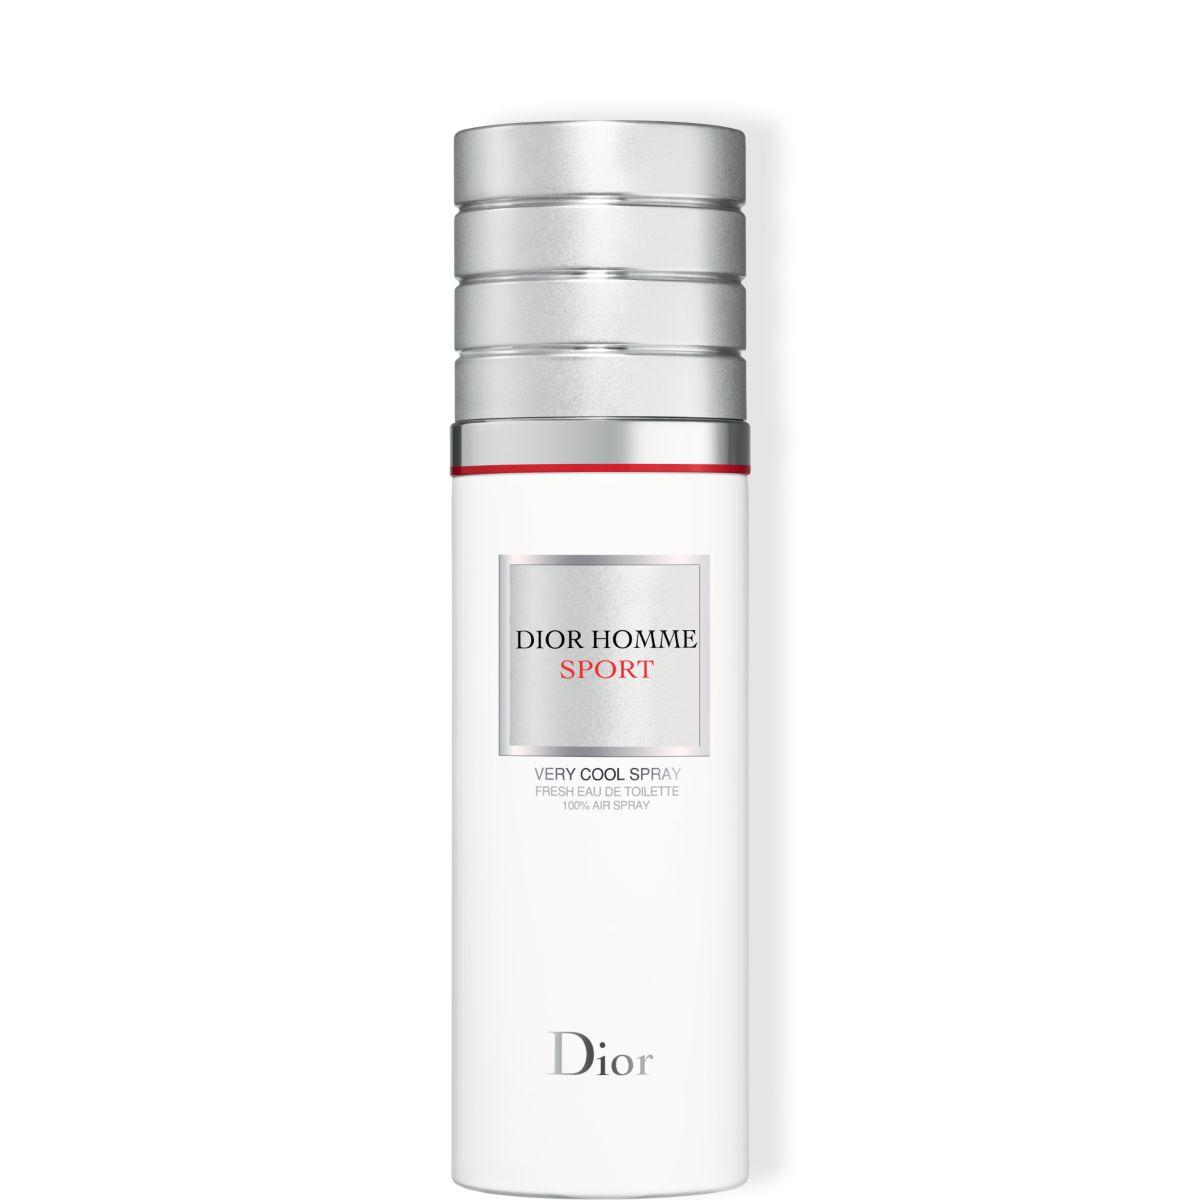 Dior - Dior Homme Sport - Very Cool Spray